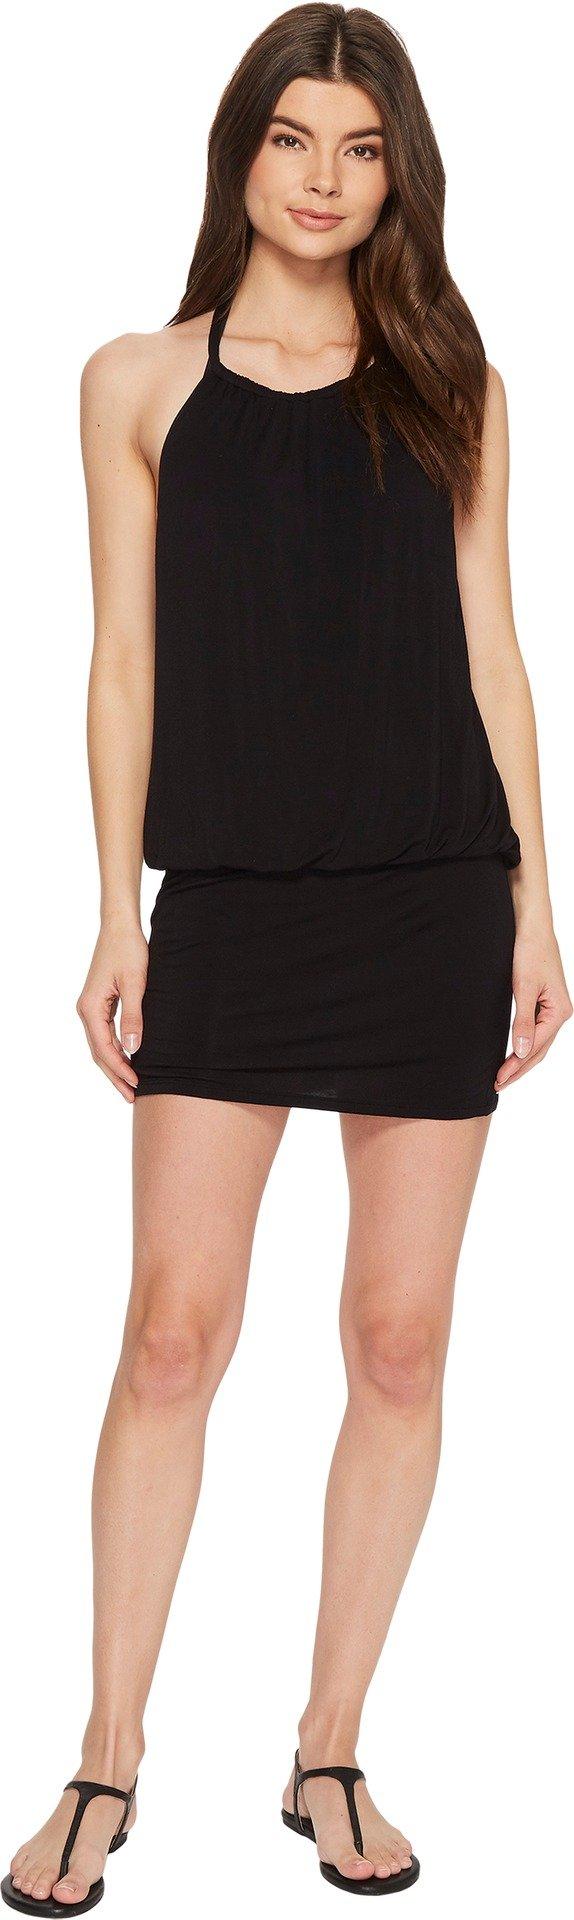 Laundry by Shelli Segal Women's Blouson Cover-Up Dress Black X-Large